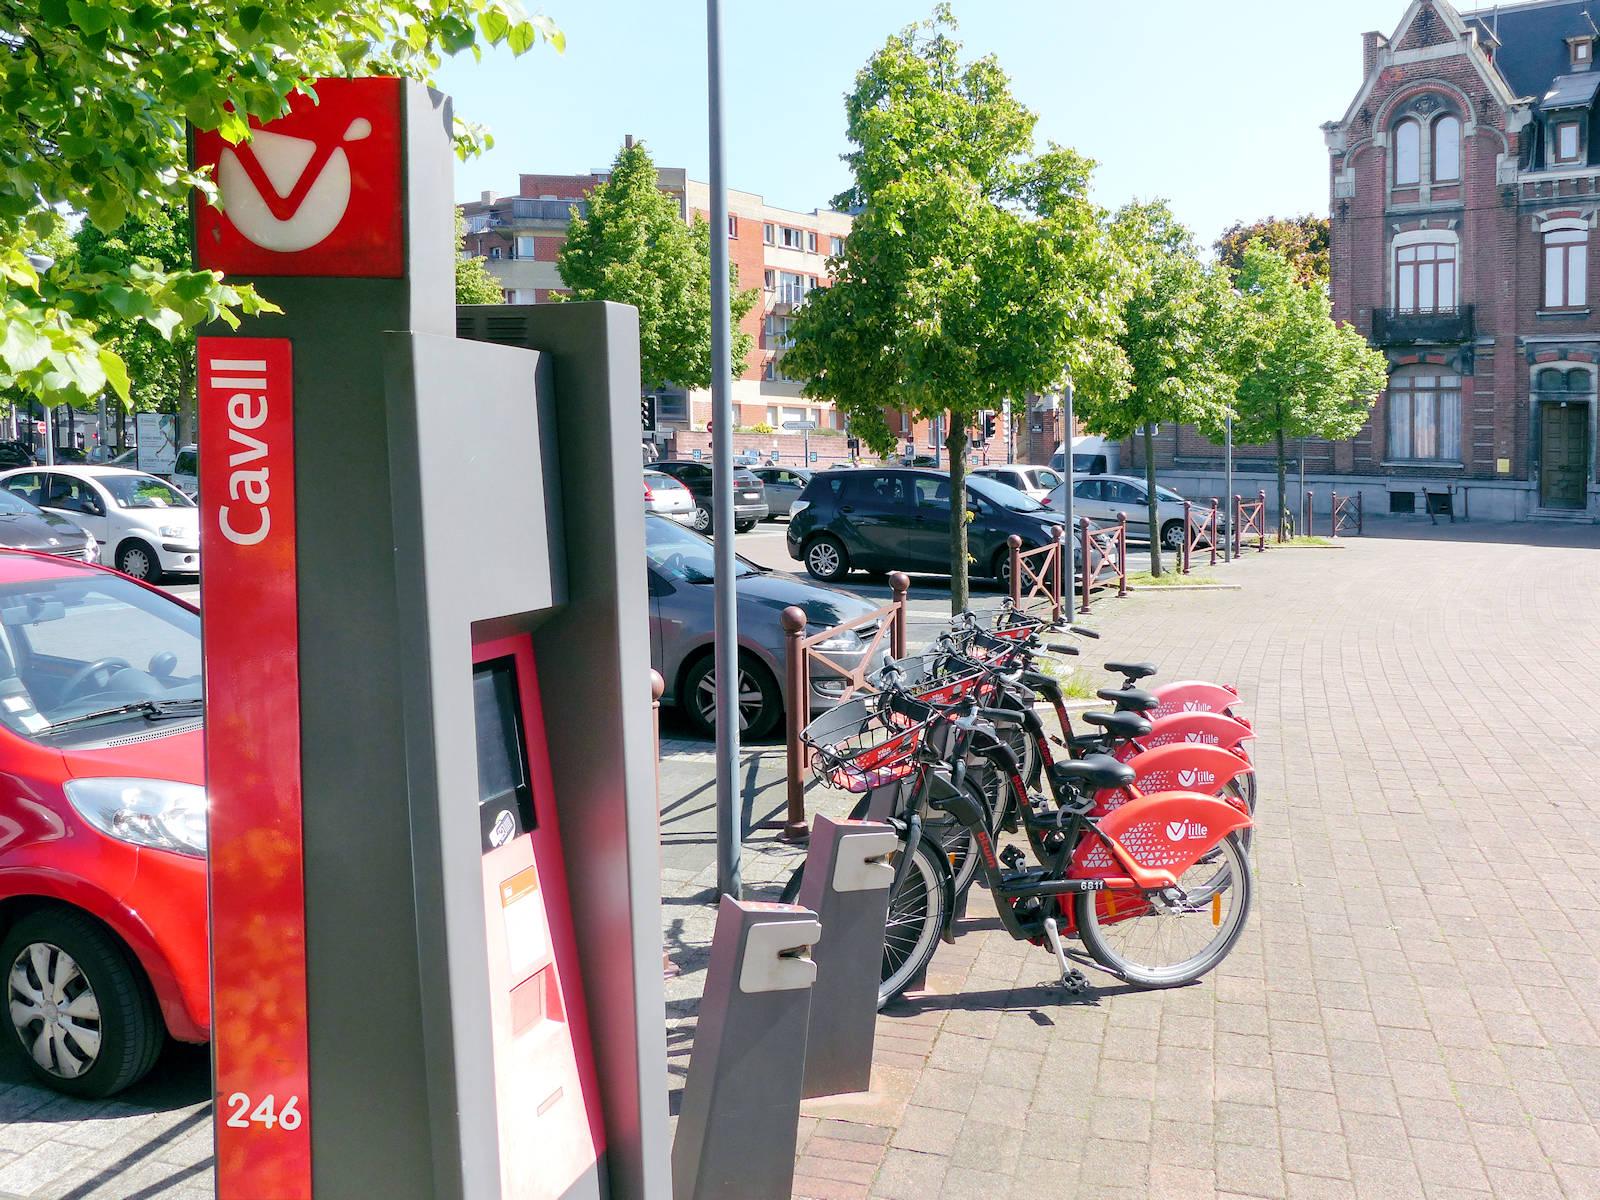 Tourcoing - Station V'Lille Cavell